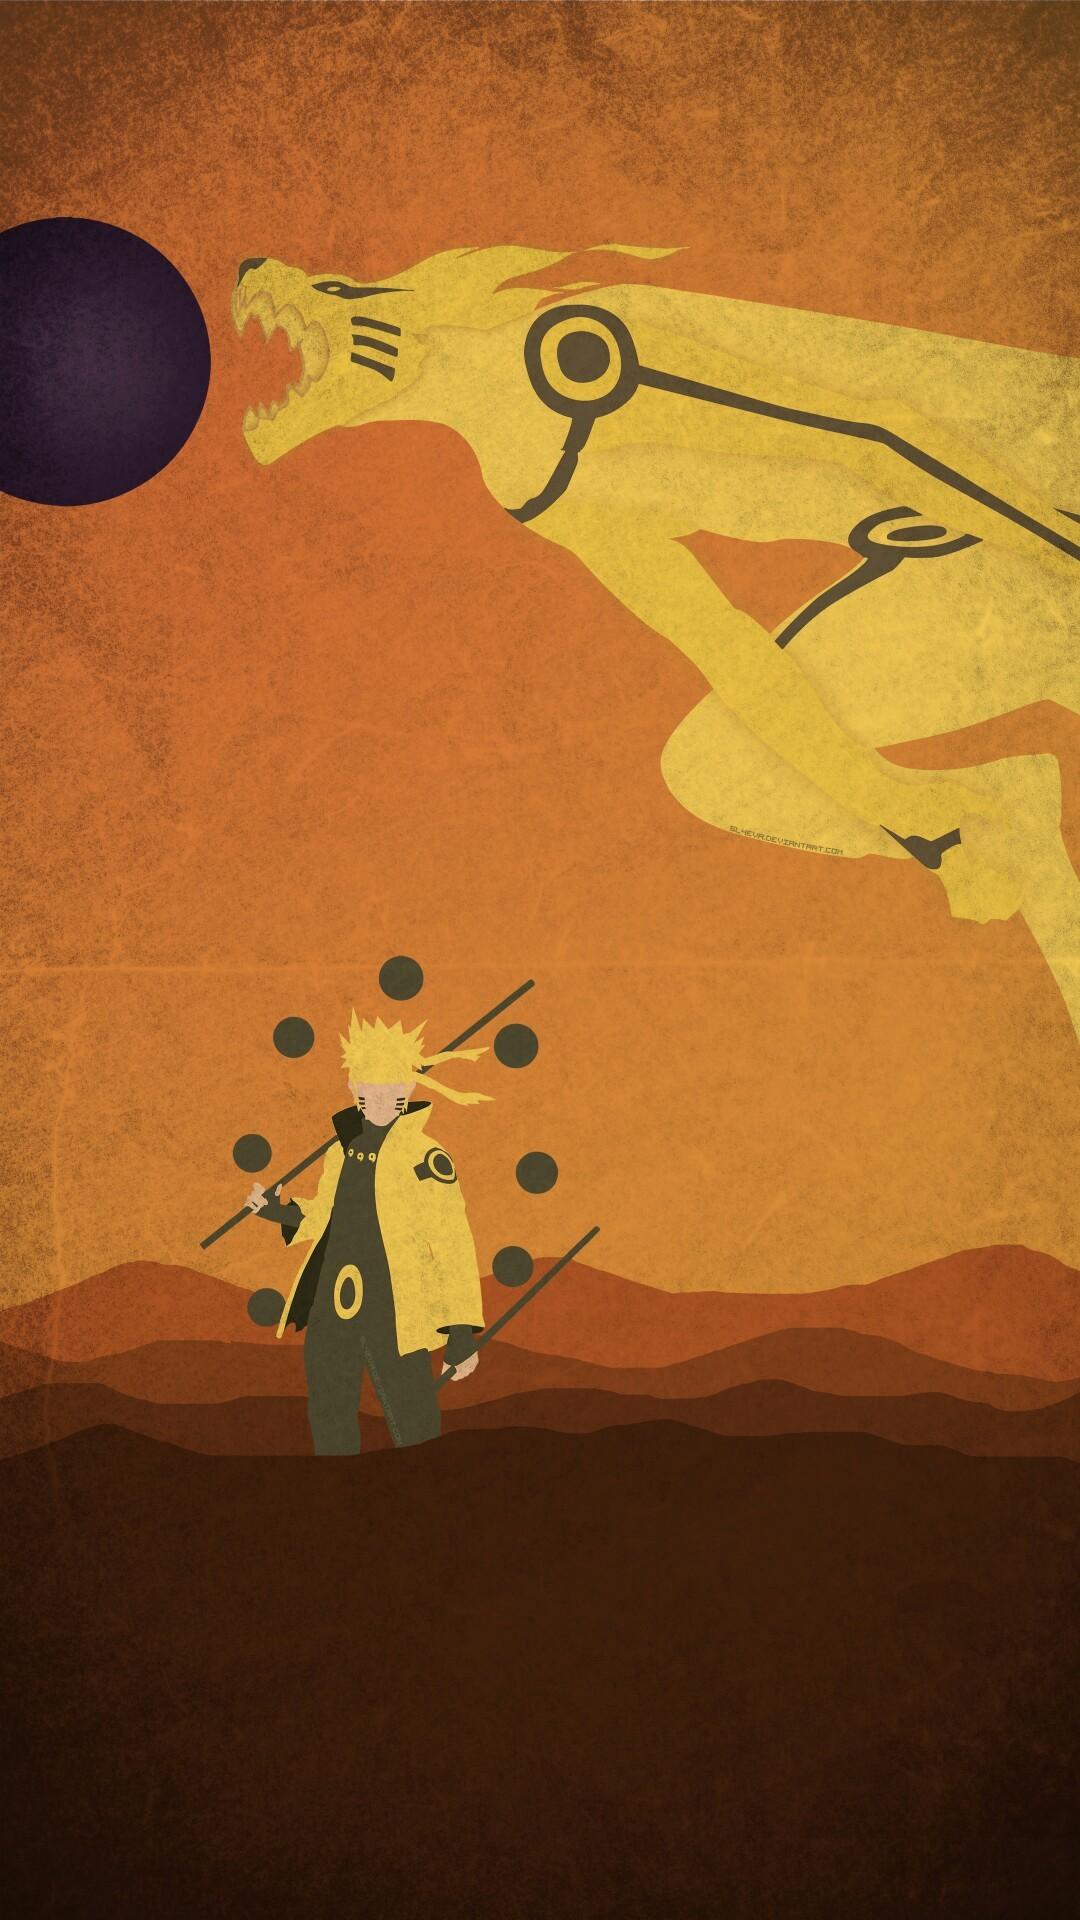 Amazing Wallpaper Naruto Minimalistic - 184779  Collection_264991.jpg